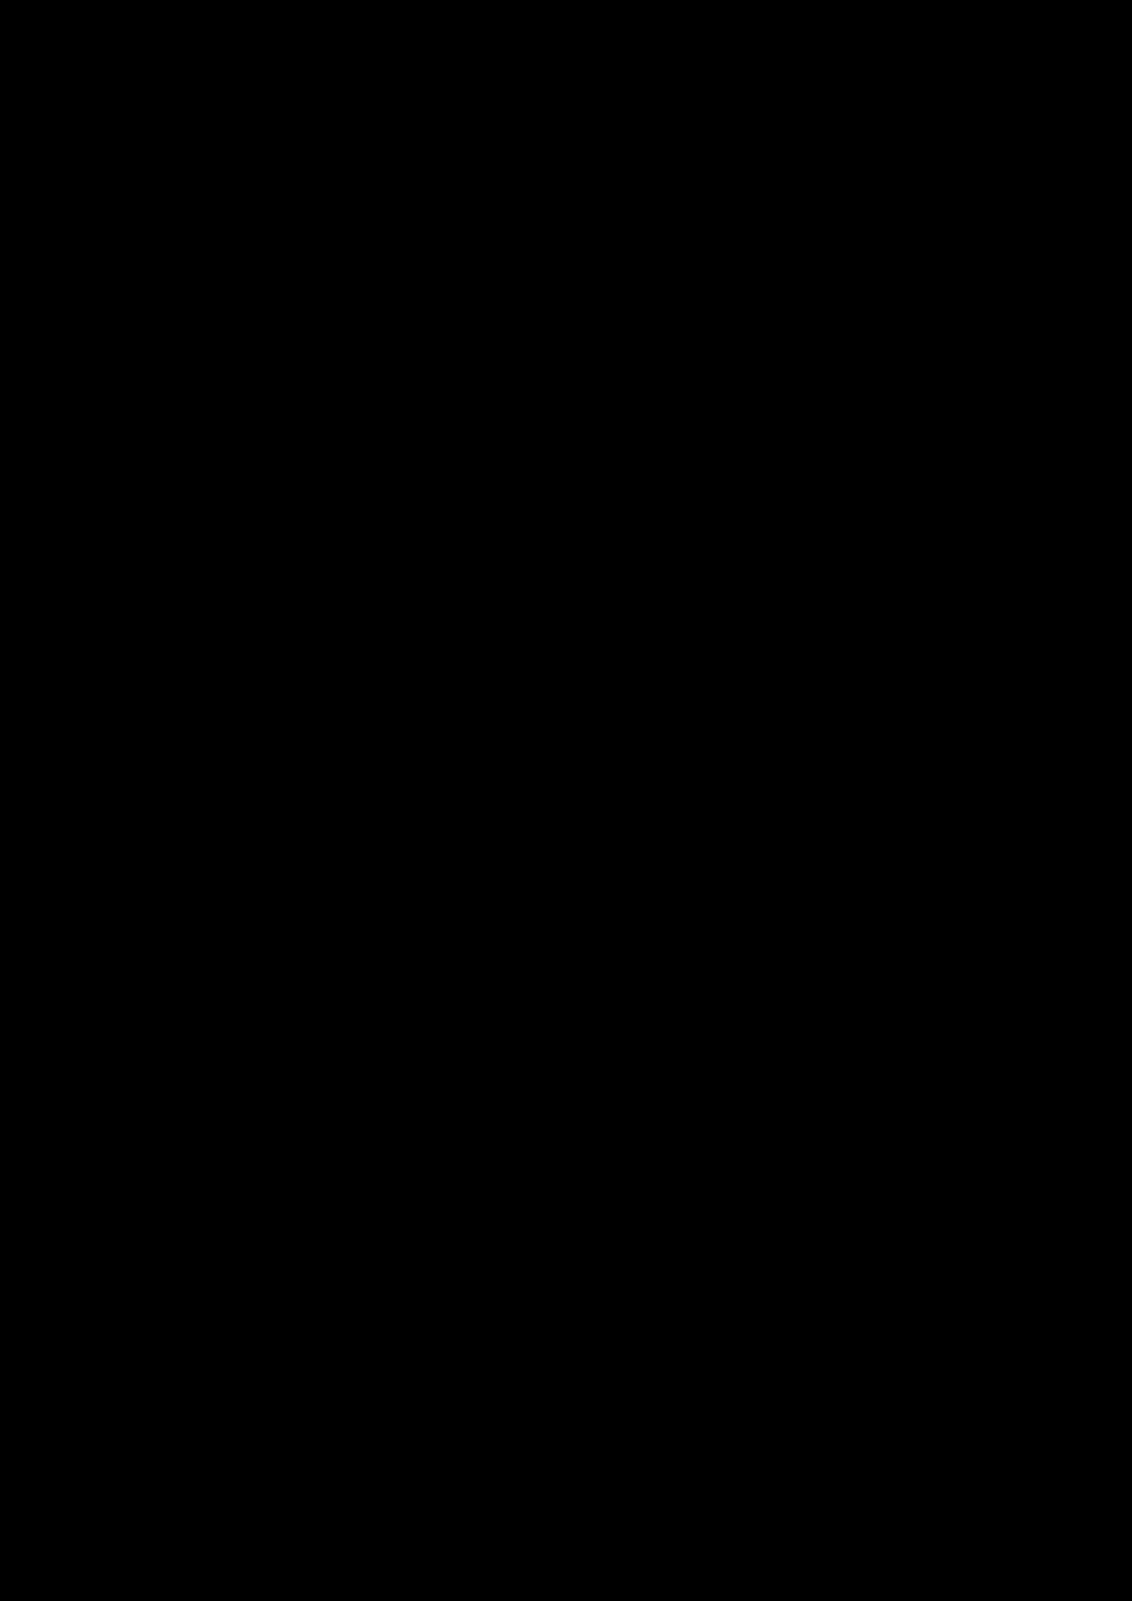 Ispoved Pervogo Boga slide, Image 68